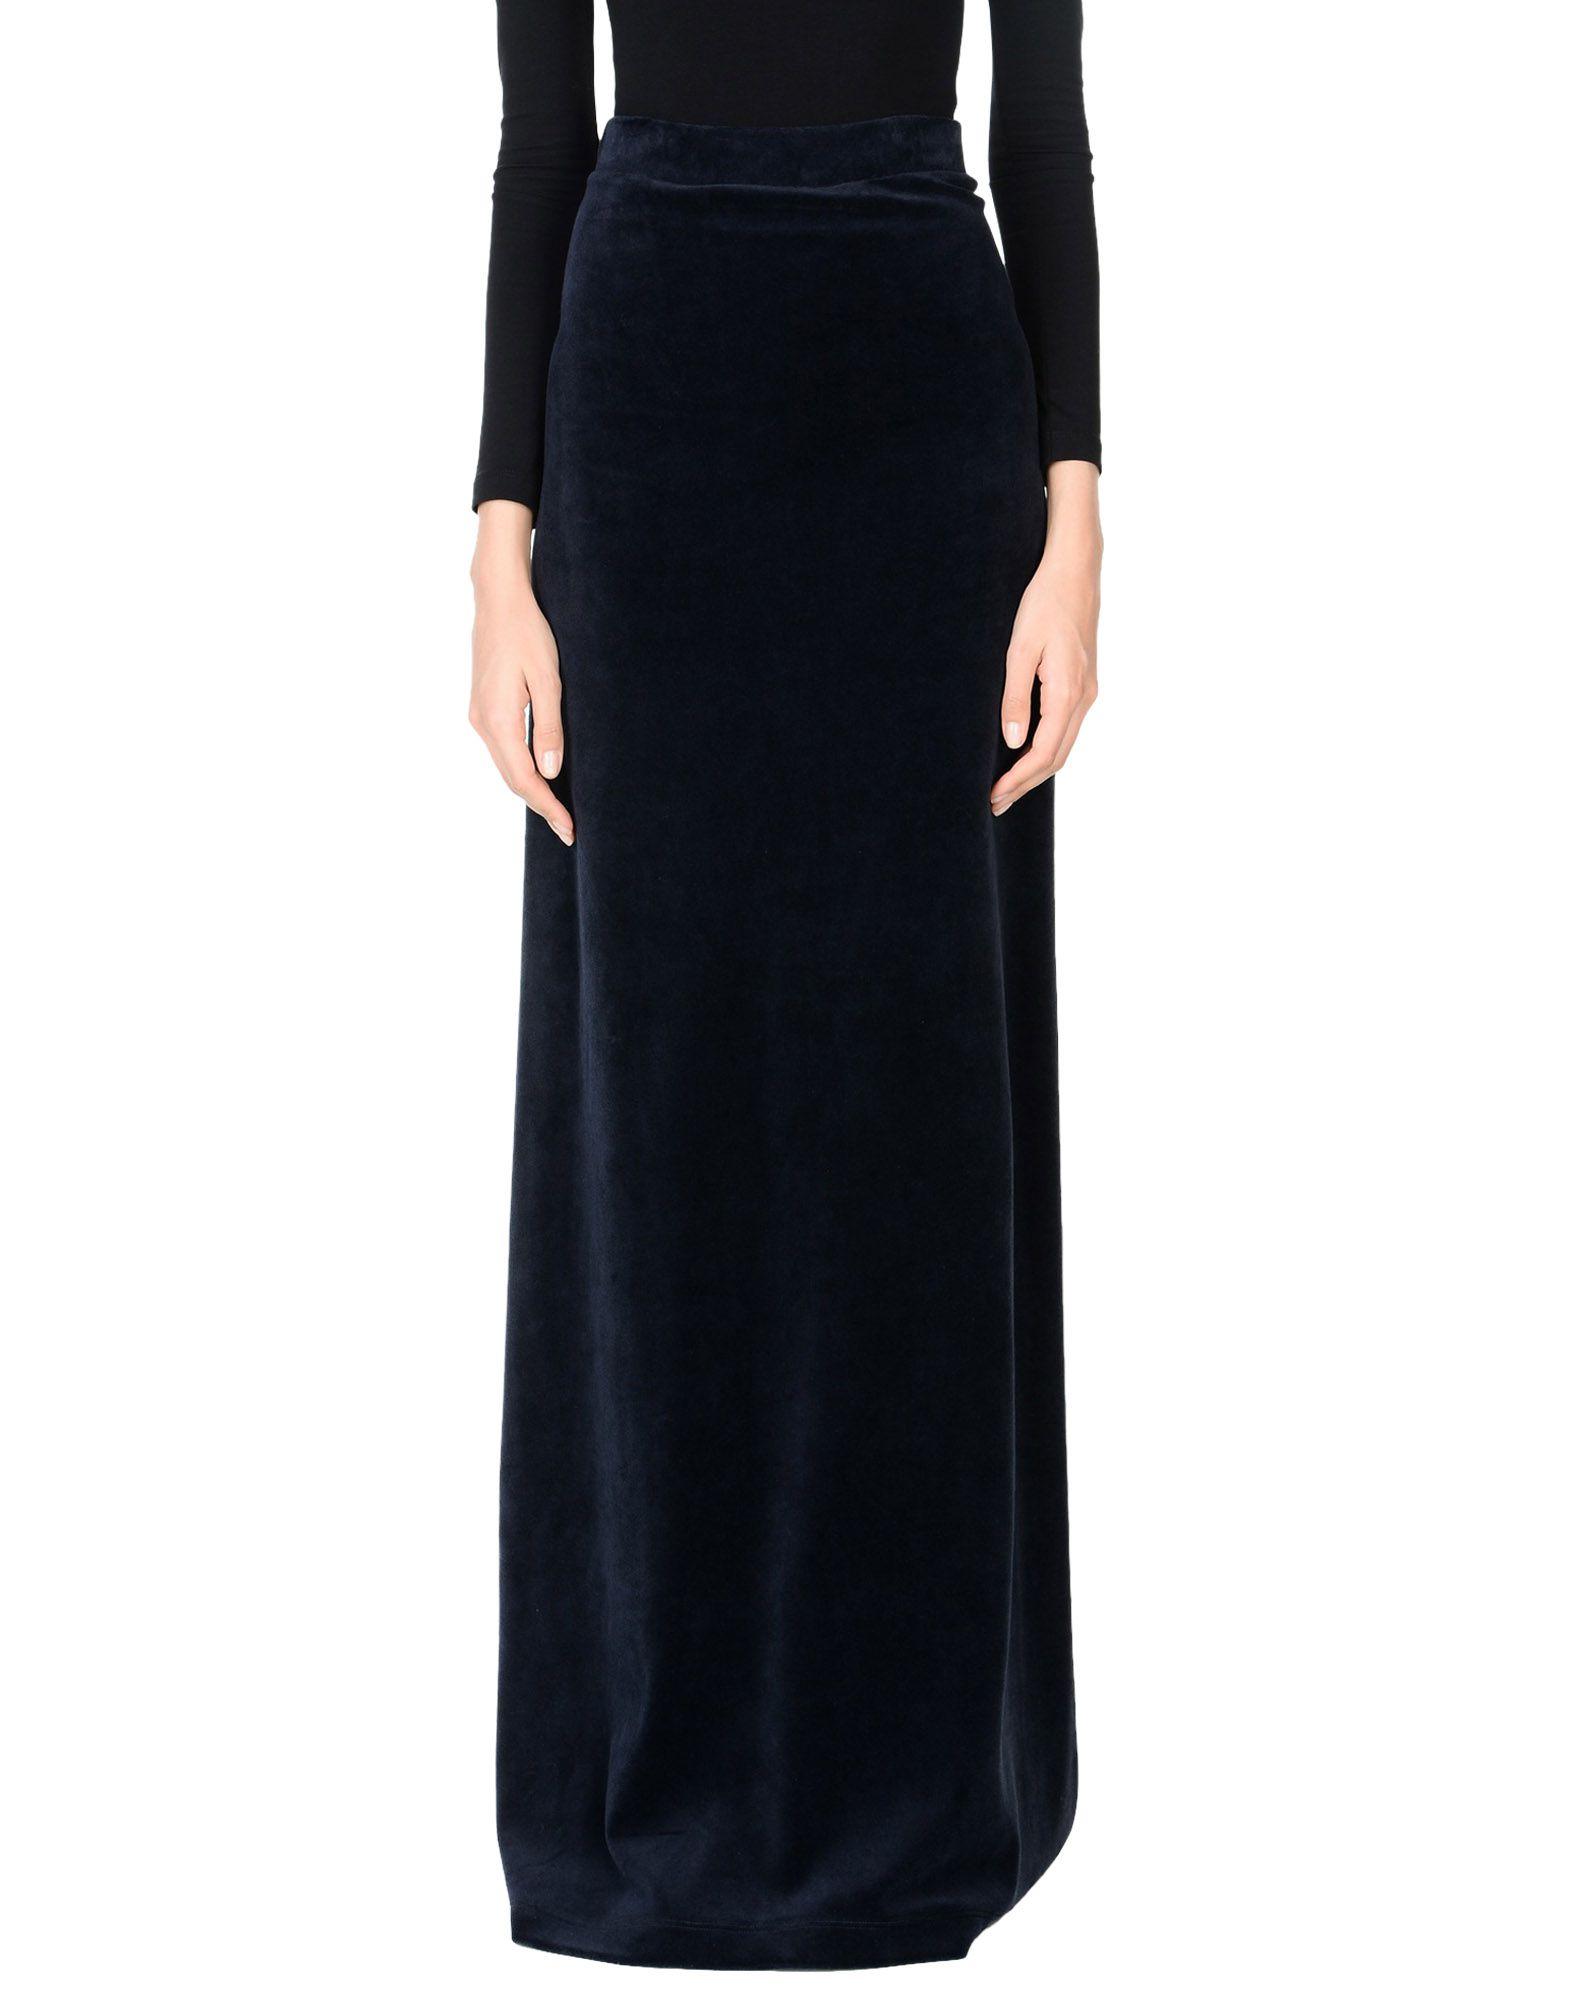 JUICY COUTURE Длинная юбка fontana couture длинная юбка